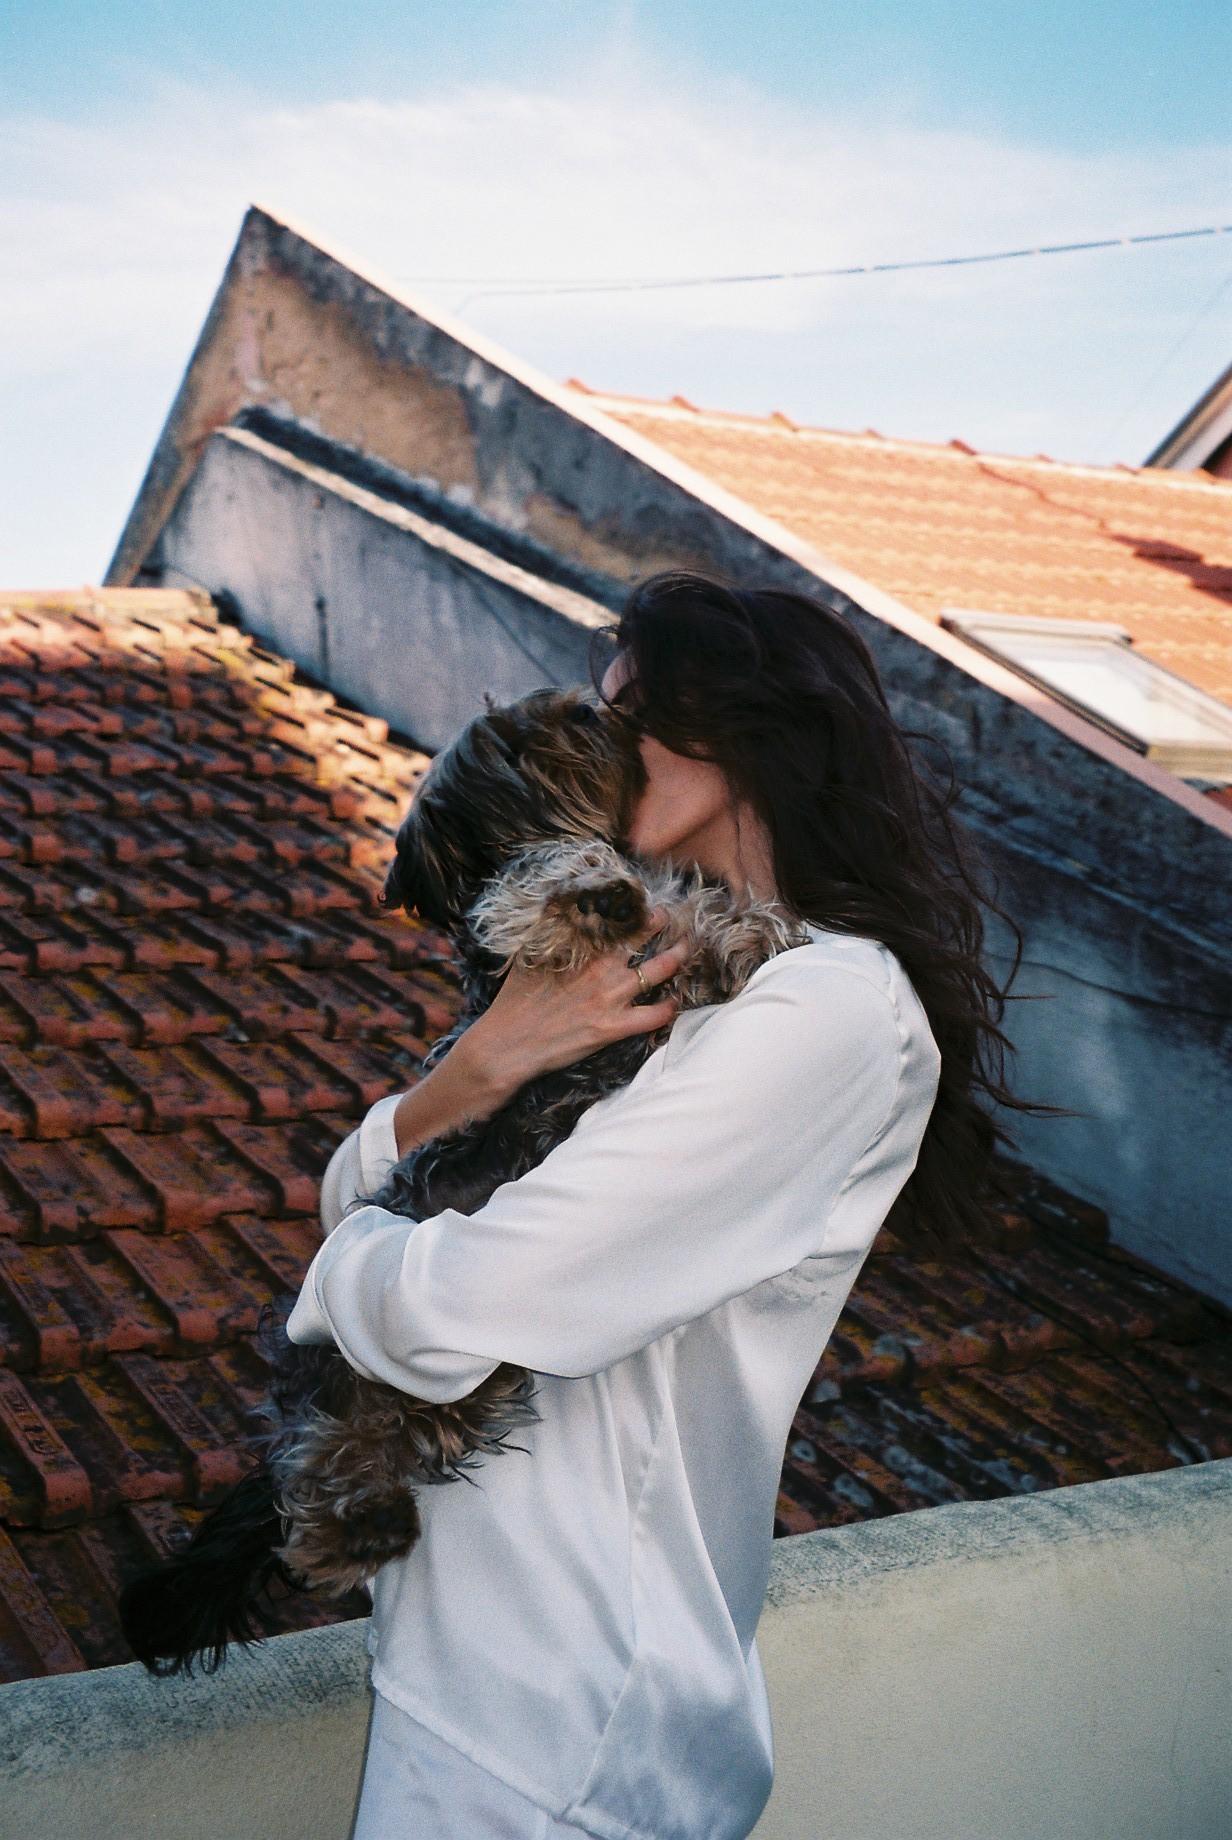 Kenzo, my friend Catarina's dog. / Kenzo, o cão da minha amiga Catarina.